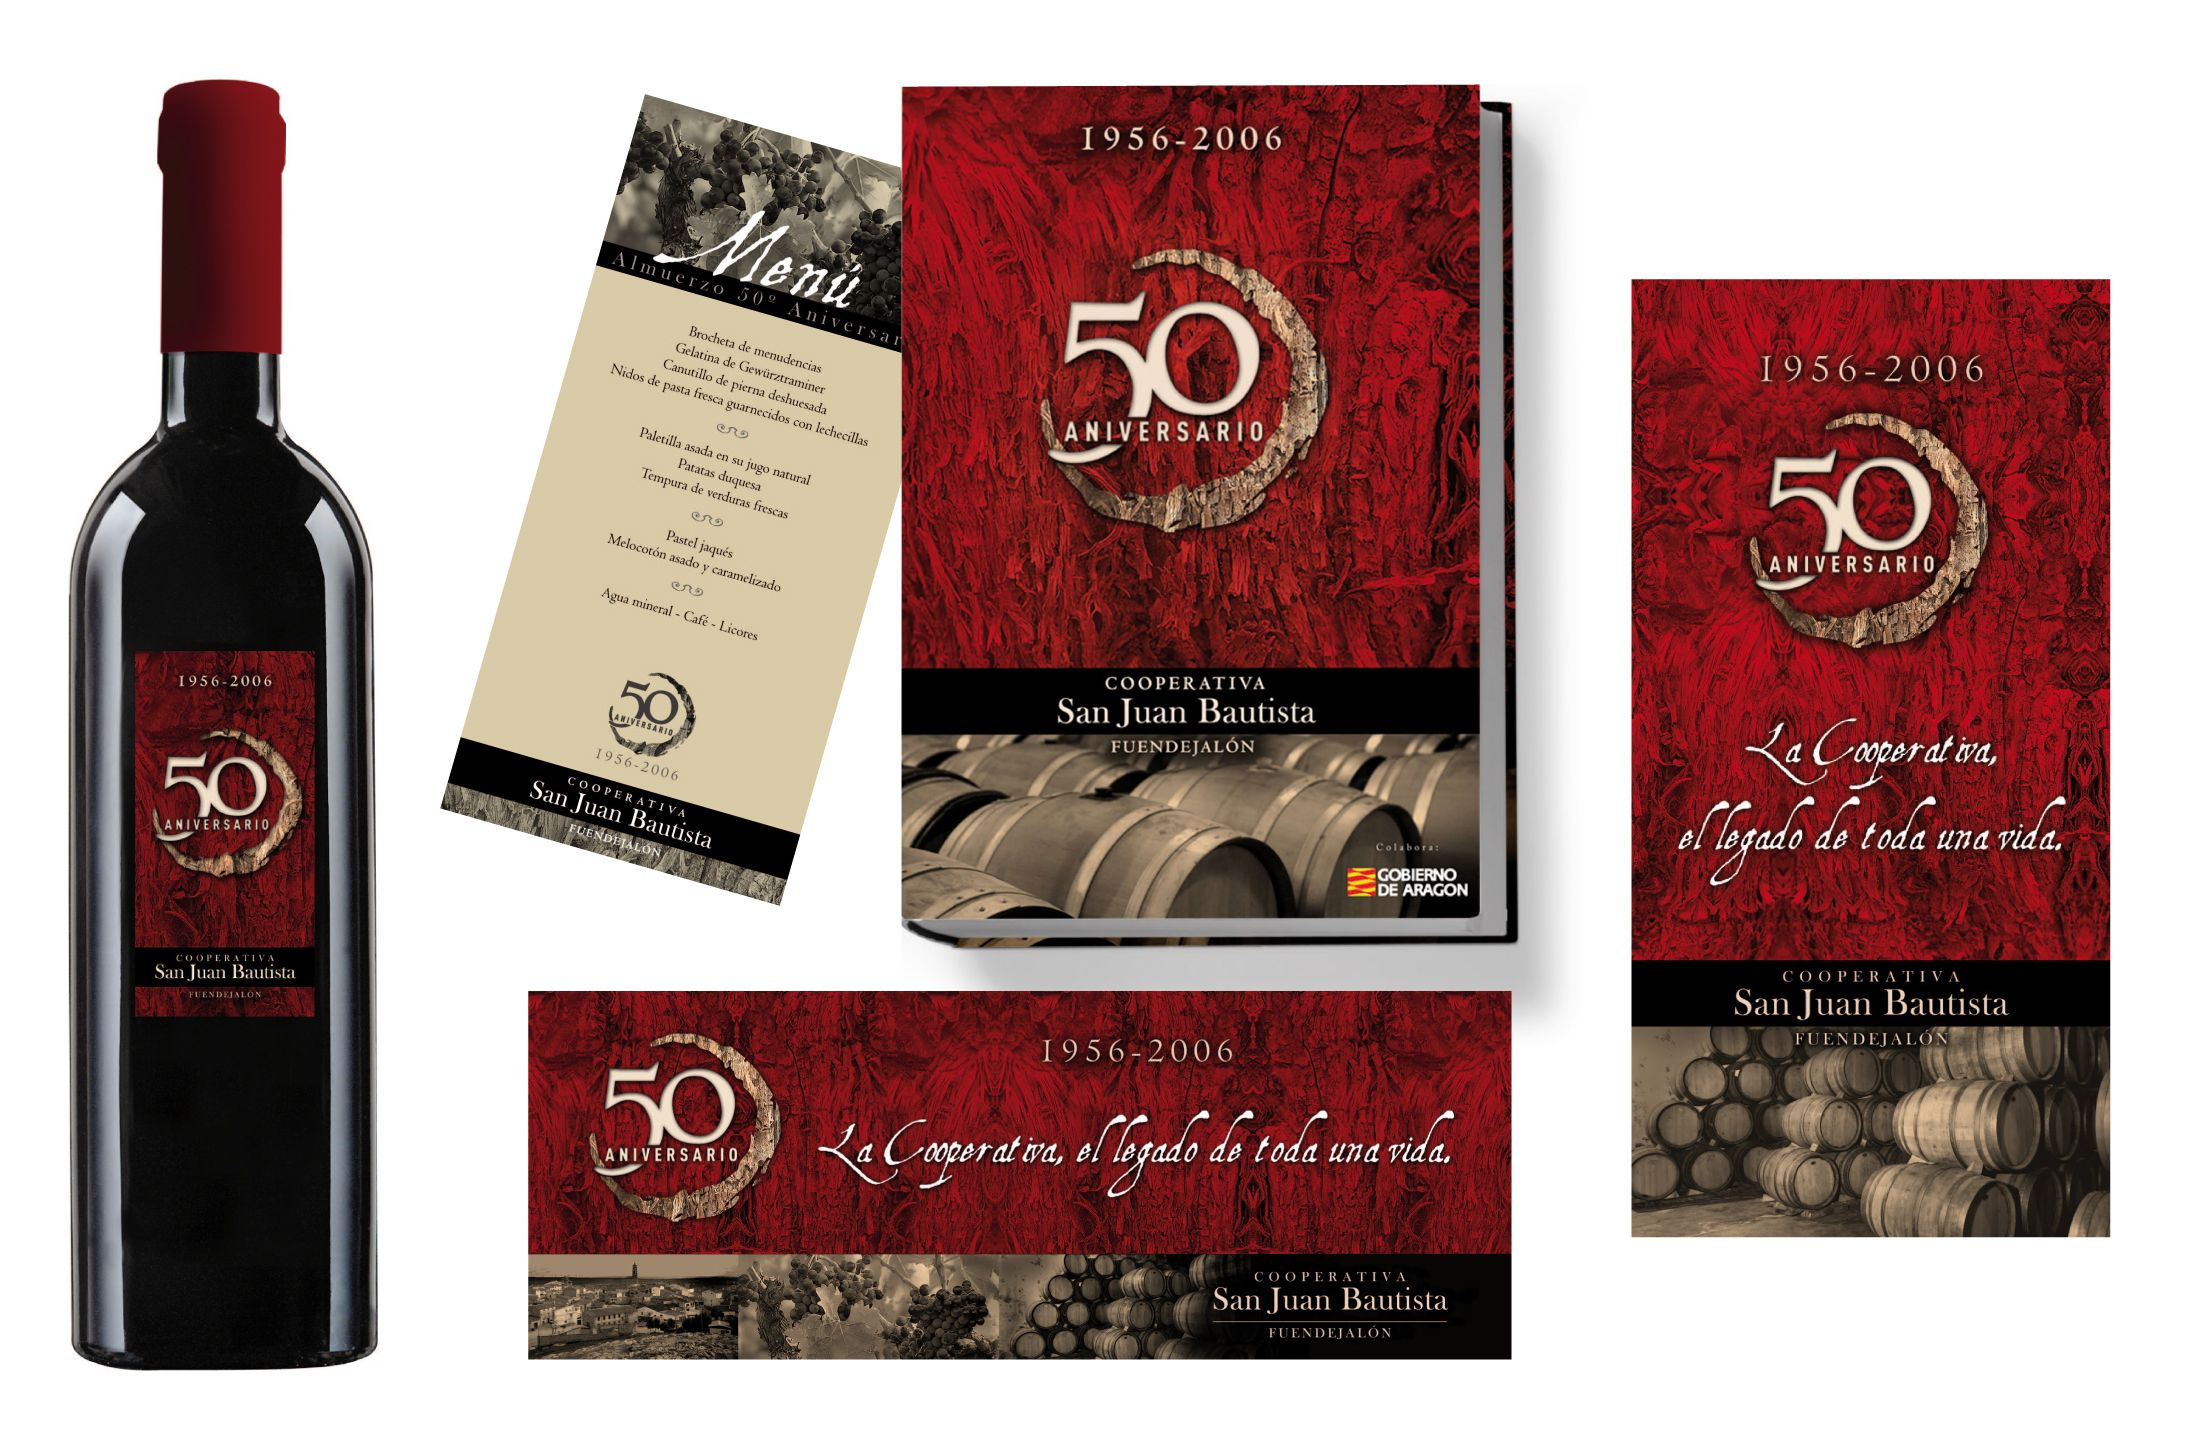 Elementos Aniversario Cooperativa Fuendejalon 50º Aniversario 50º Aniversario 50 Aniversario Aniversario